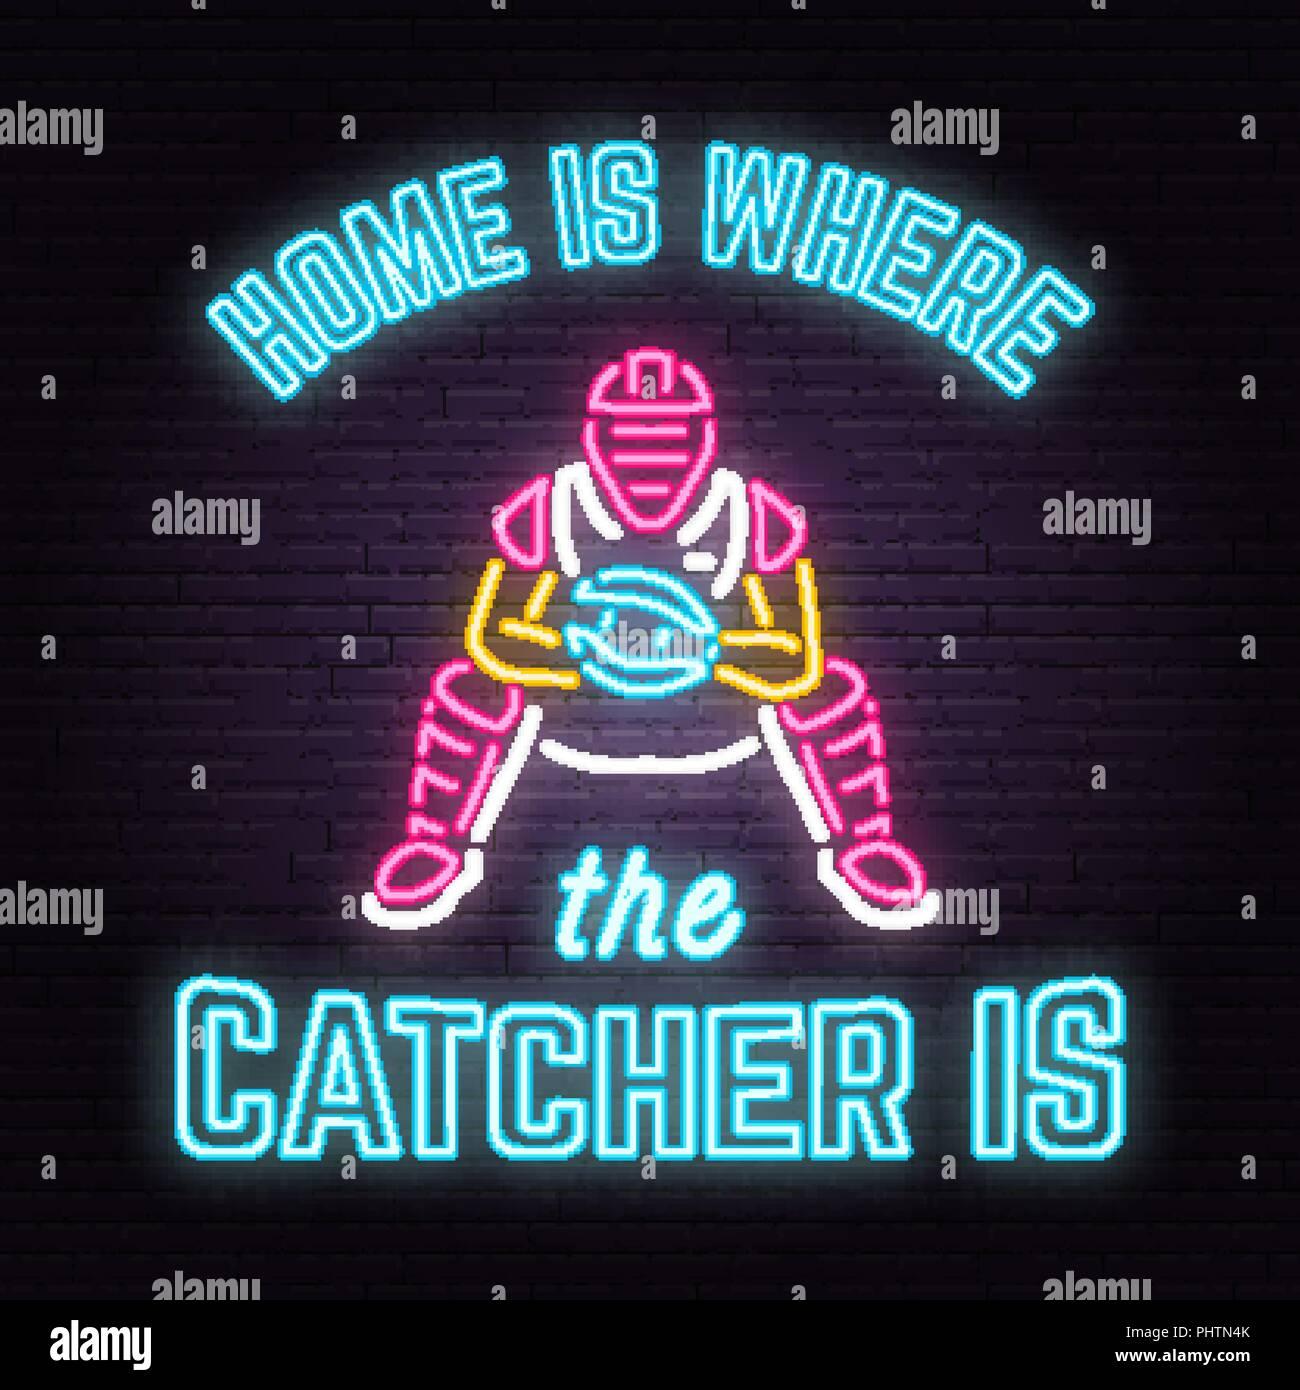 College Baseball Catcher Stock Photos & College Baseball Catcher ...